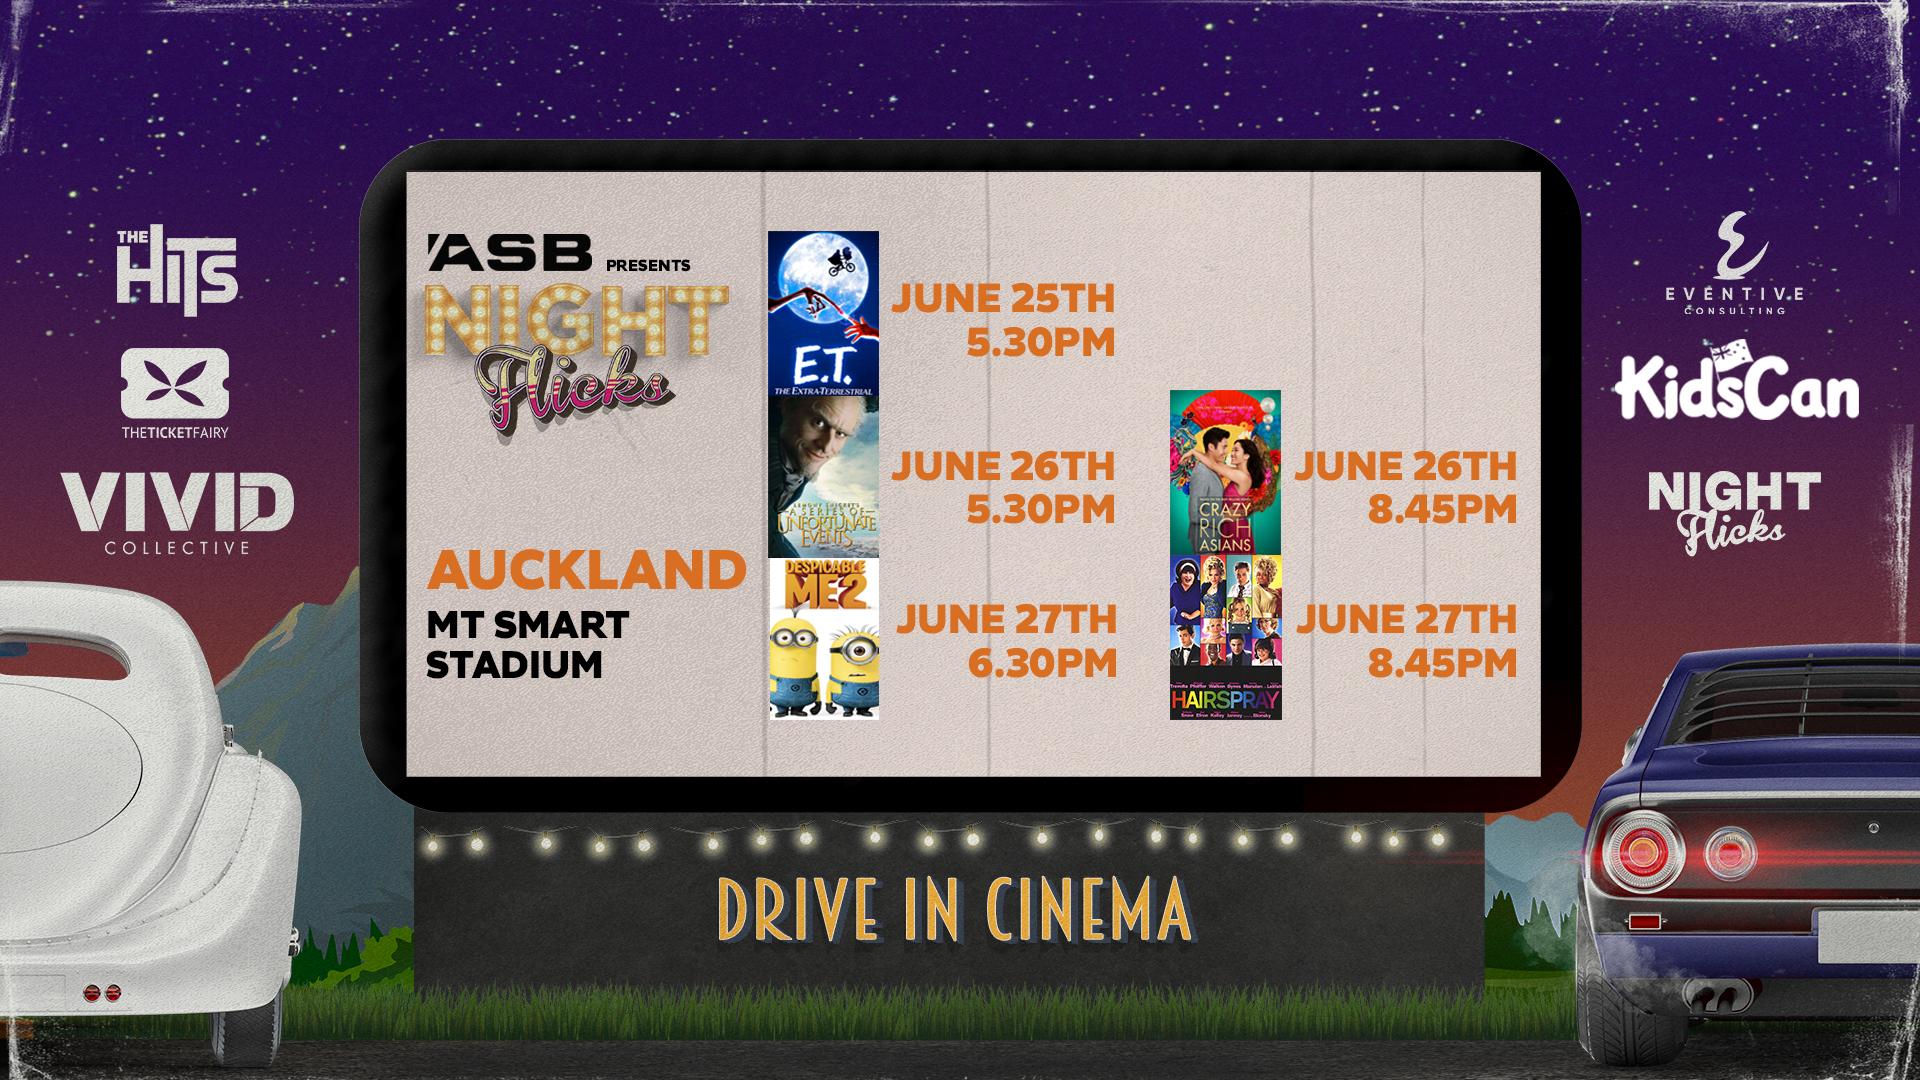 Night Flicks Drive In Cinema at Mt Smart Stadium